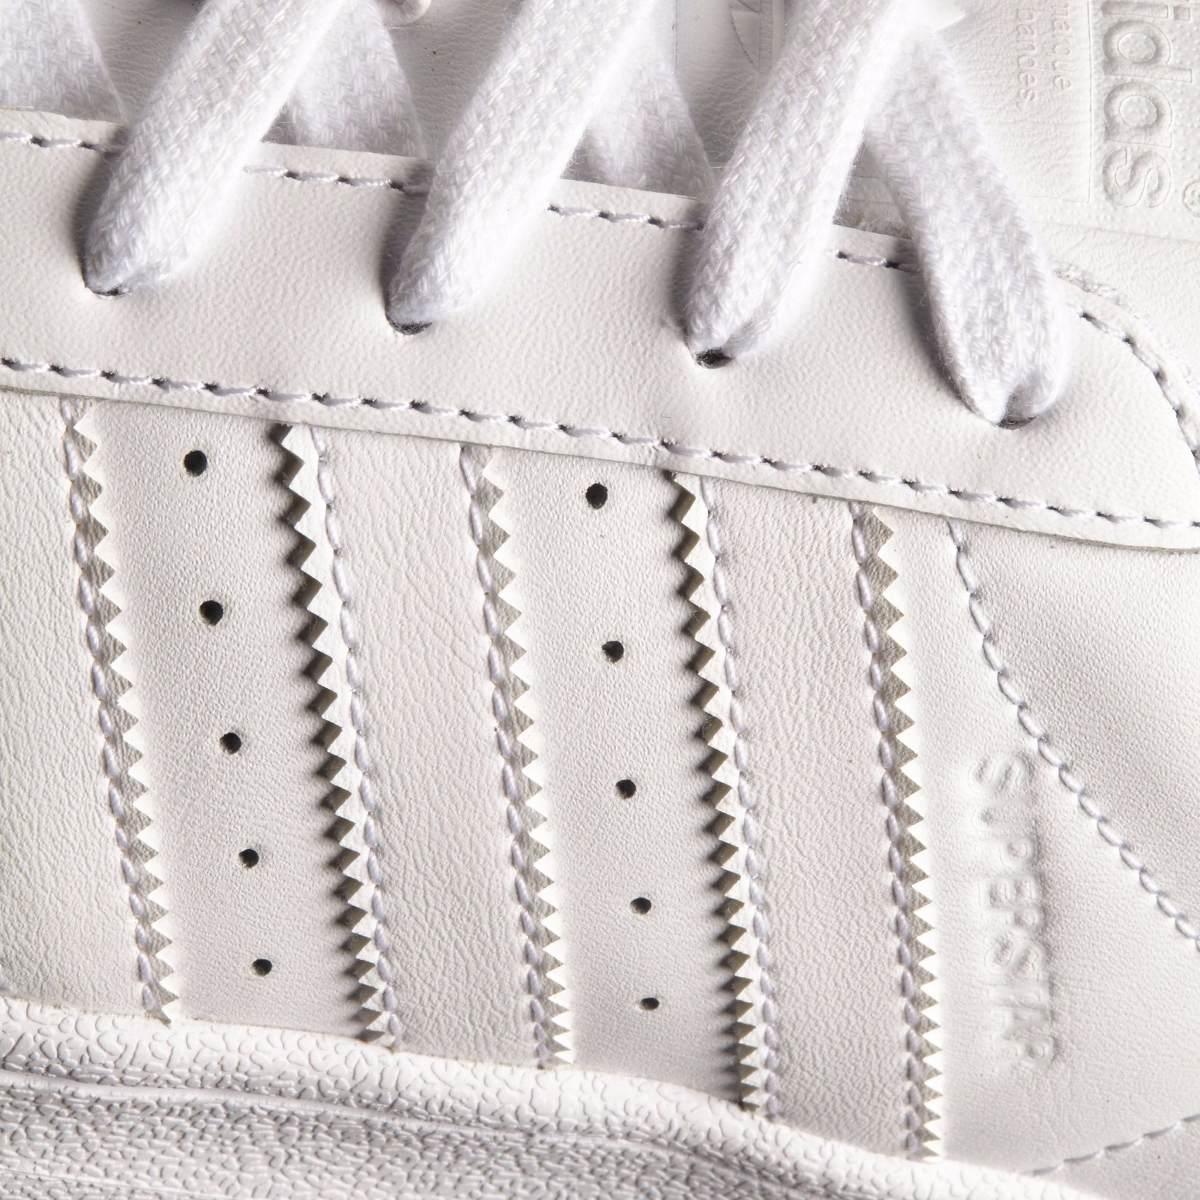 adidas Superstar Blancas Mujer Originals Puntera Originales